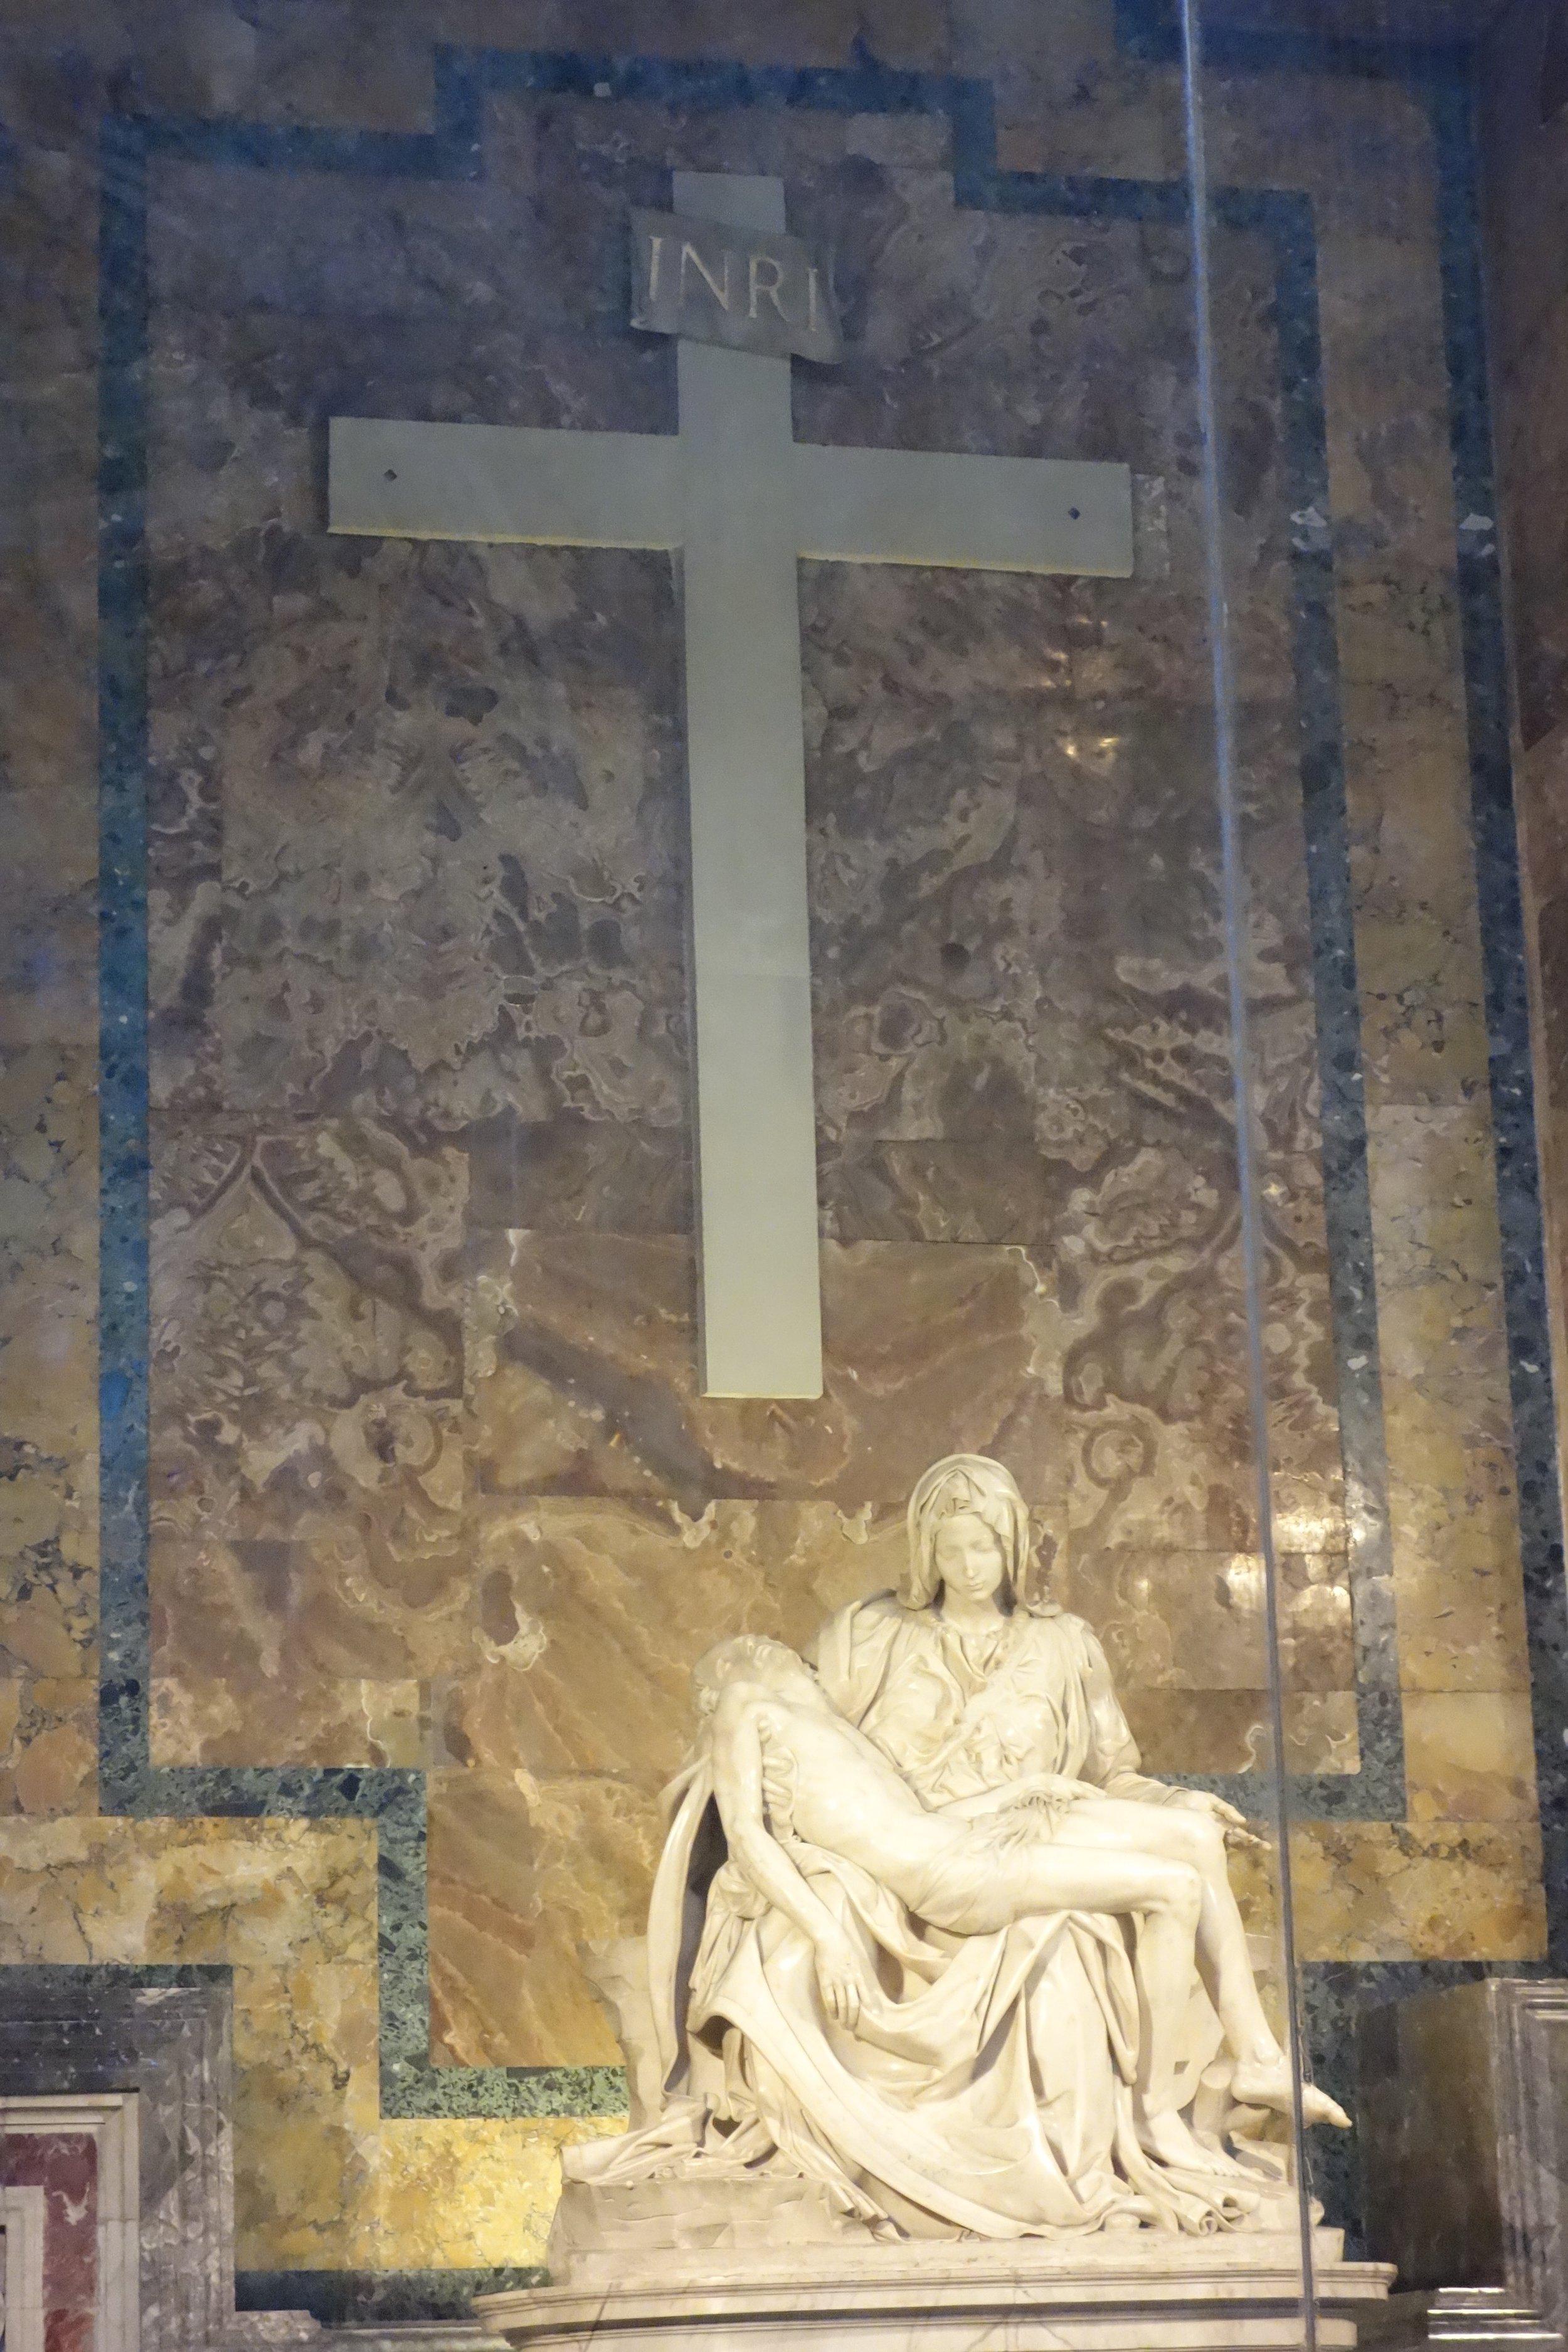 Inside St. Peter's - Mary holding Jesus